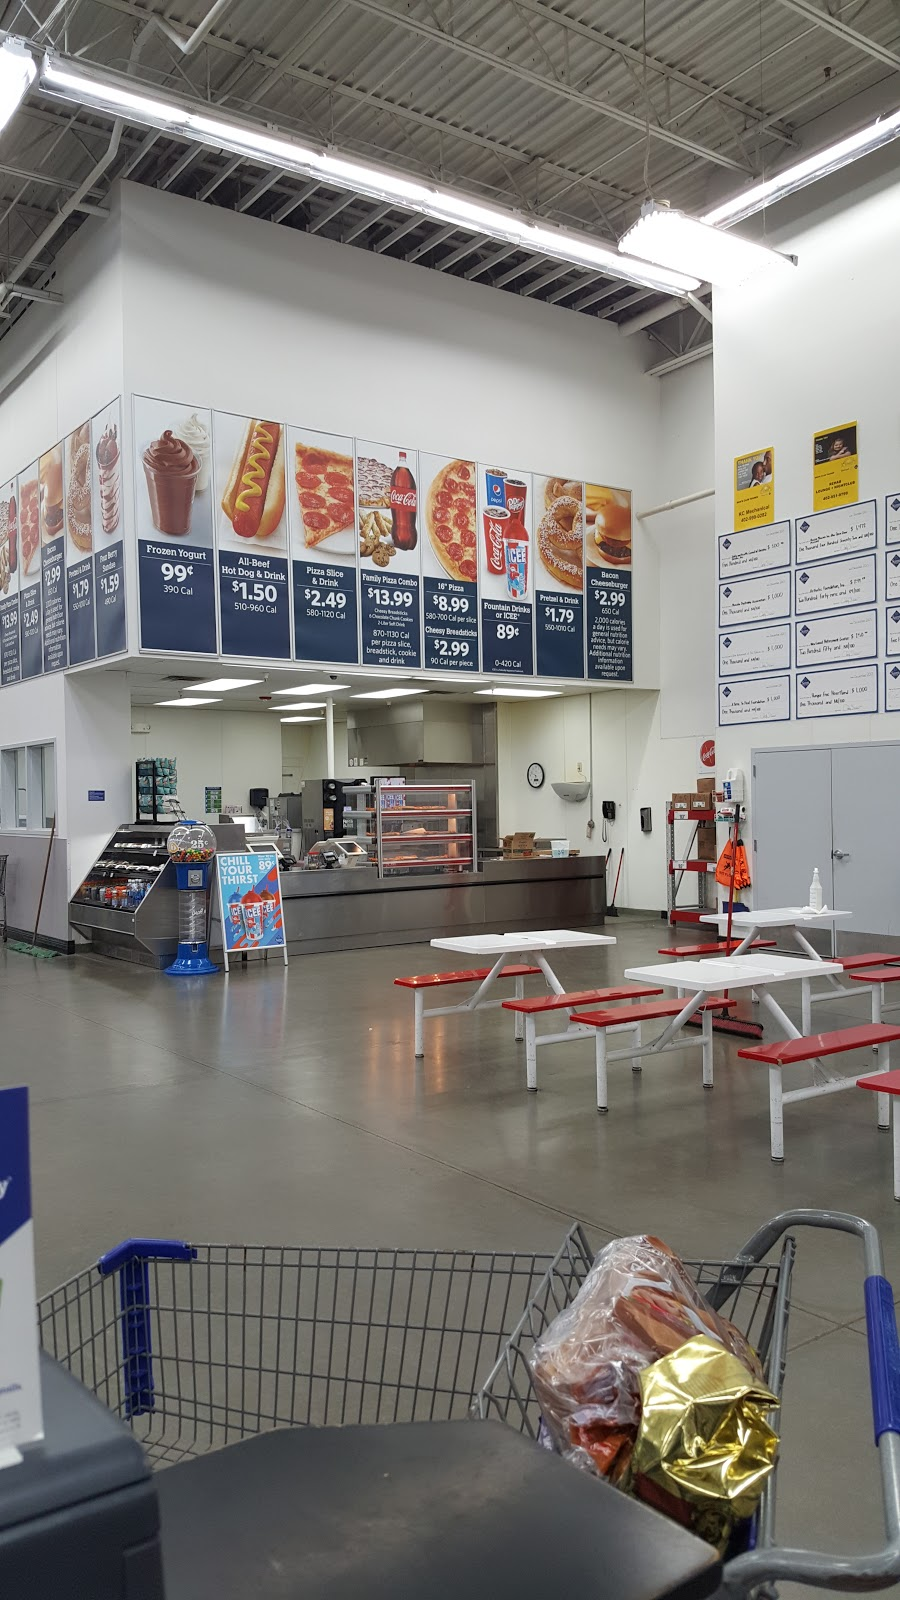 Sams Club - electronics store  | Photo 9 of 9 | Address: 13130 L St, Omaha, NE 68137, USA | Phone: (402) 334-1526